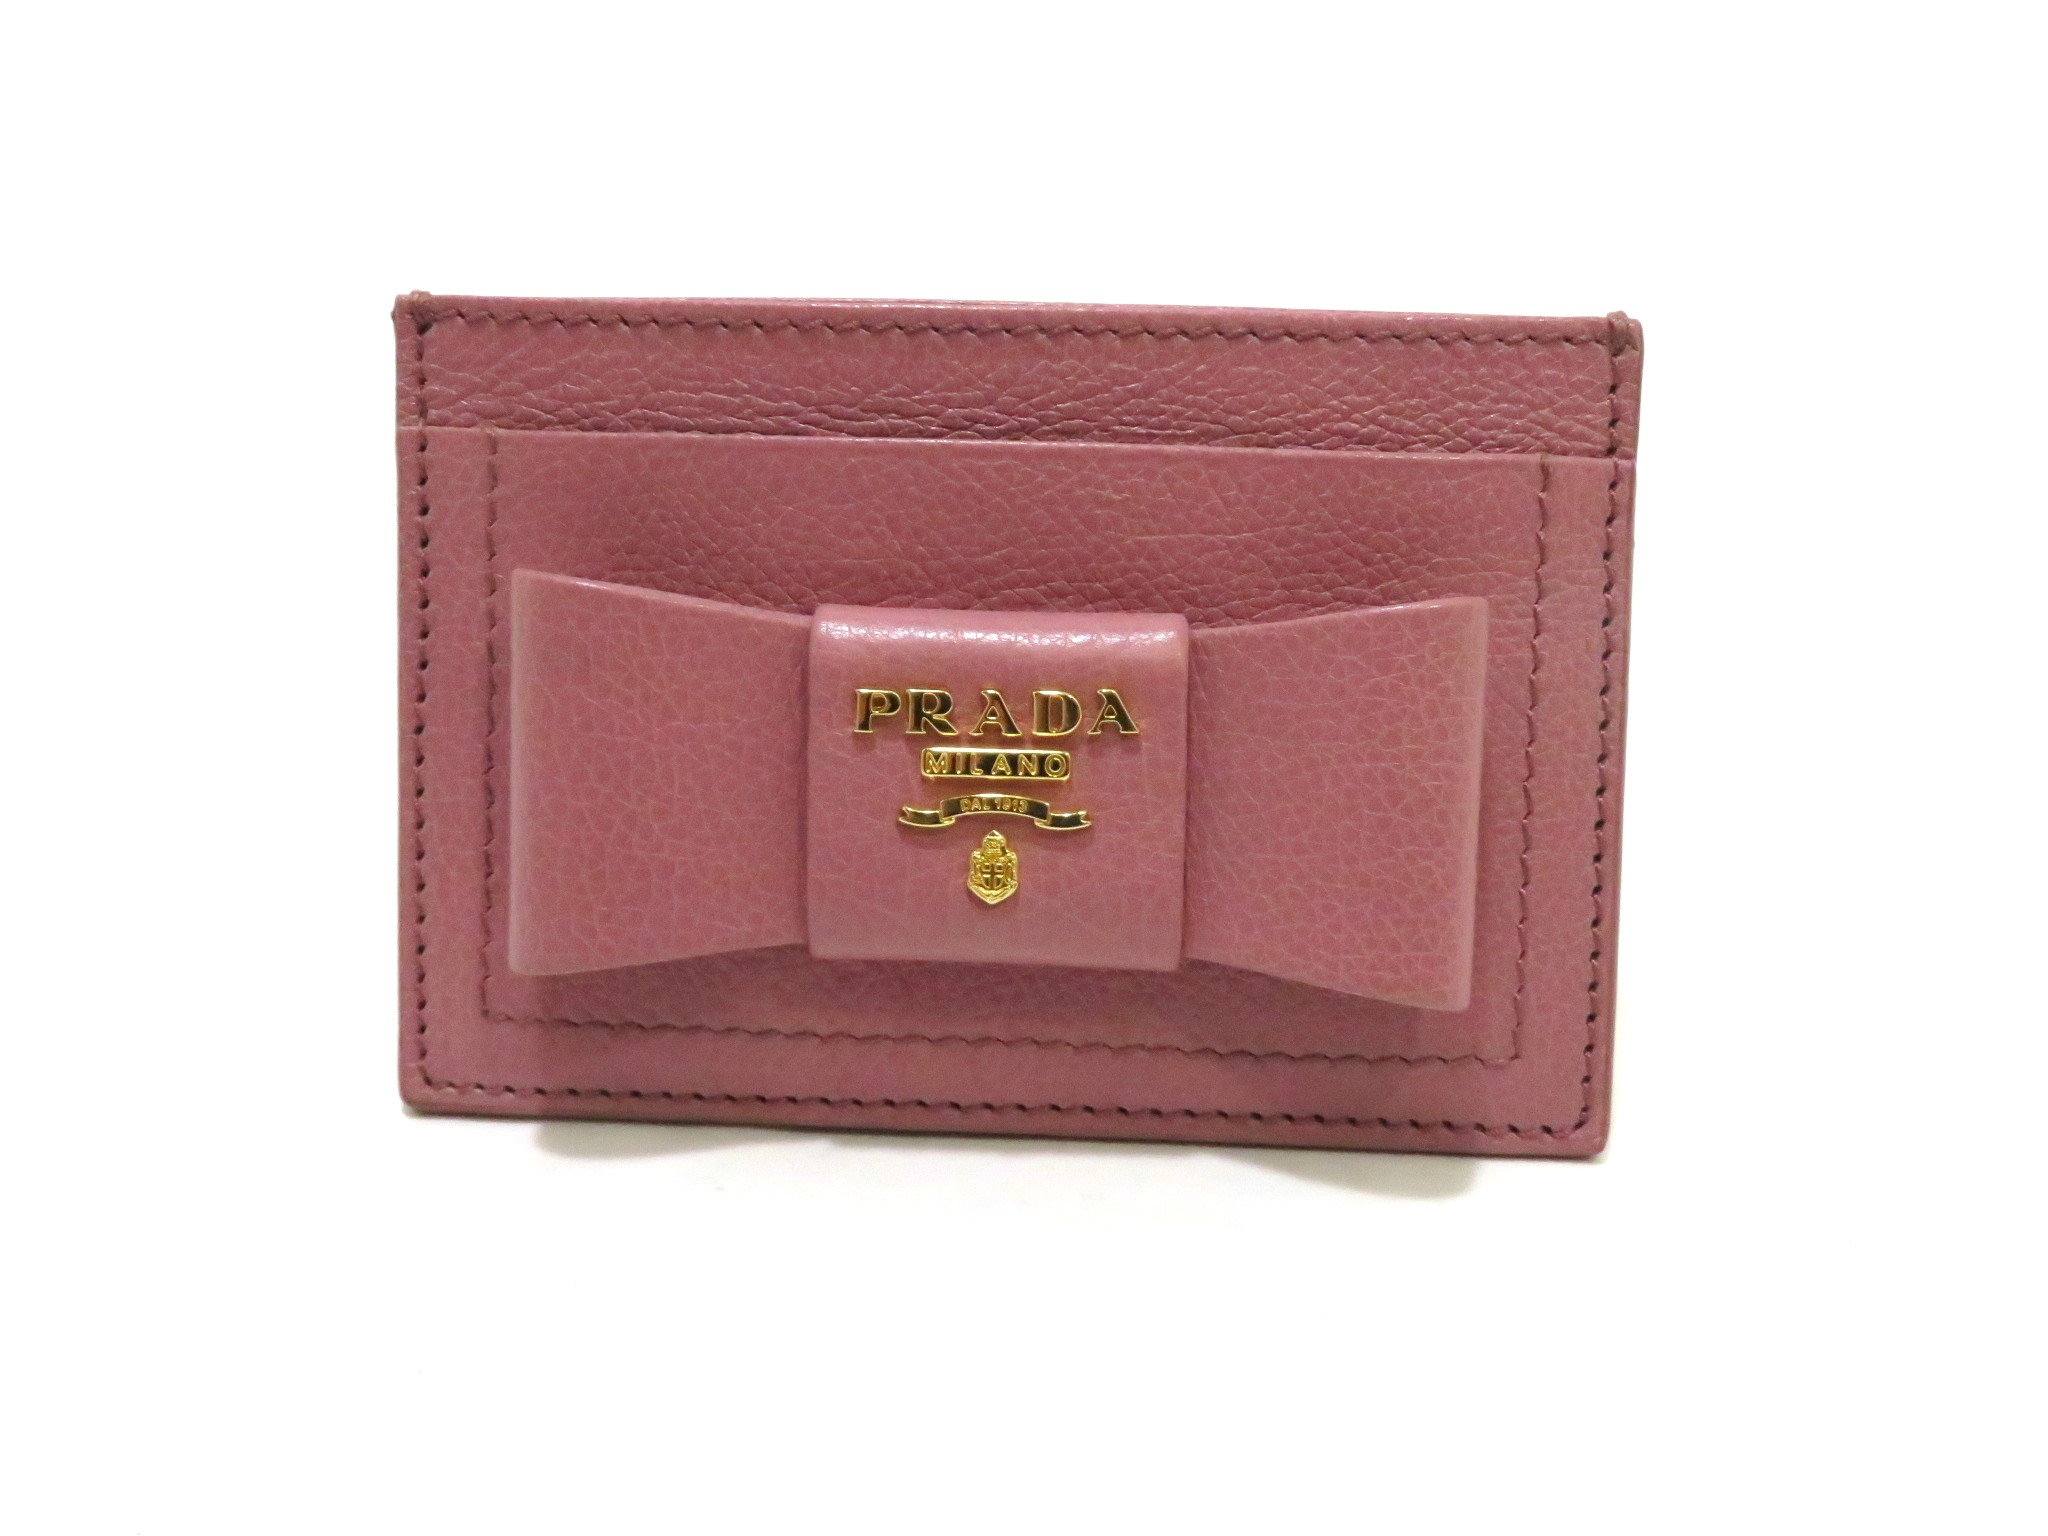 PRADA プラダ カードケース リボンモチーフ ピンク カーフ 1MC208【472】